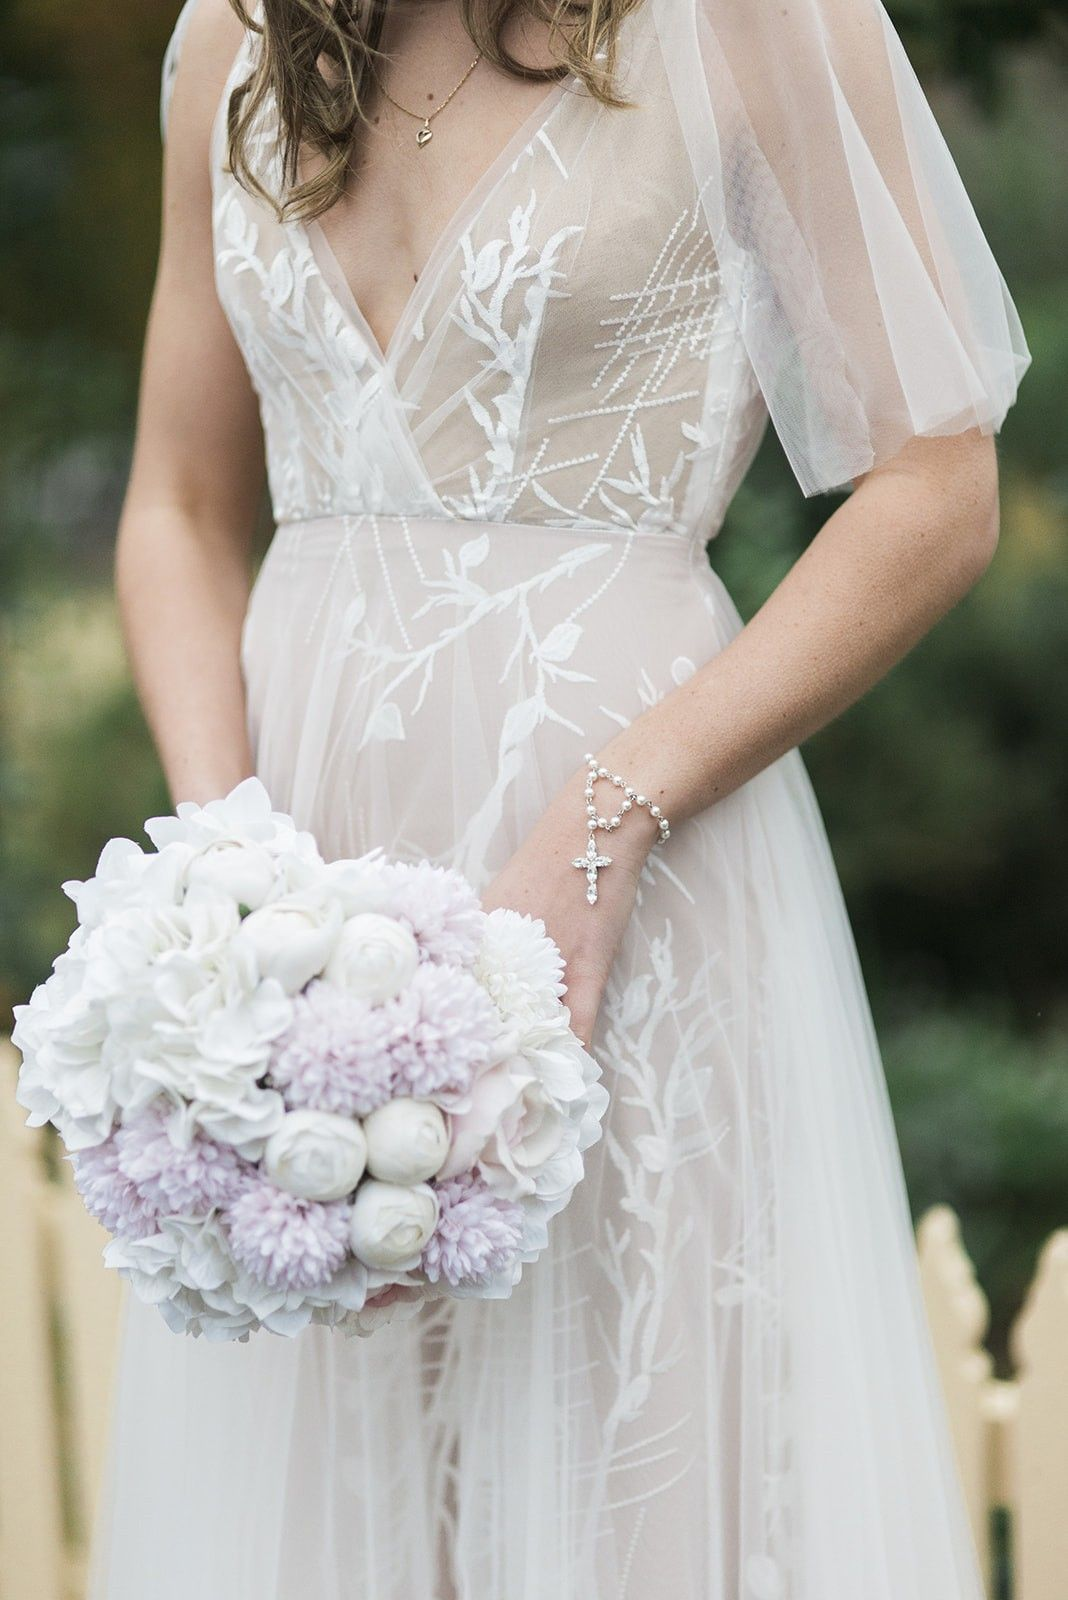 Pin By Star On Wed In 2019 Hydrangea Bouquet Wedding Wedding